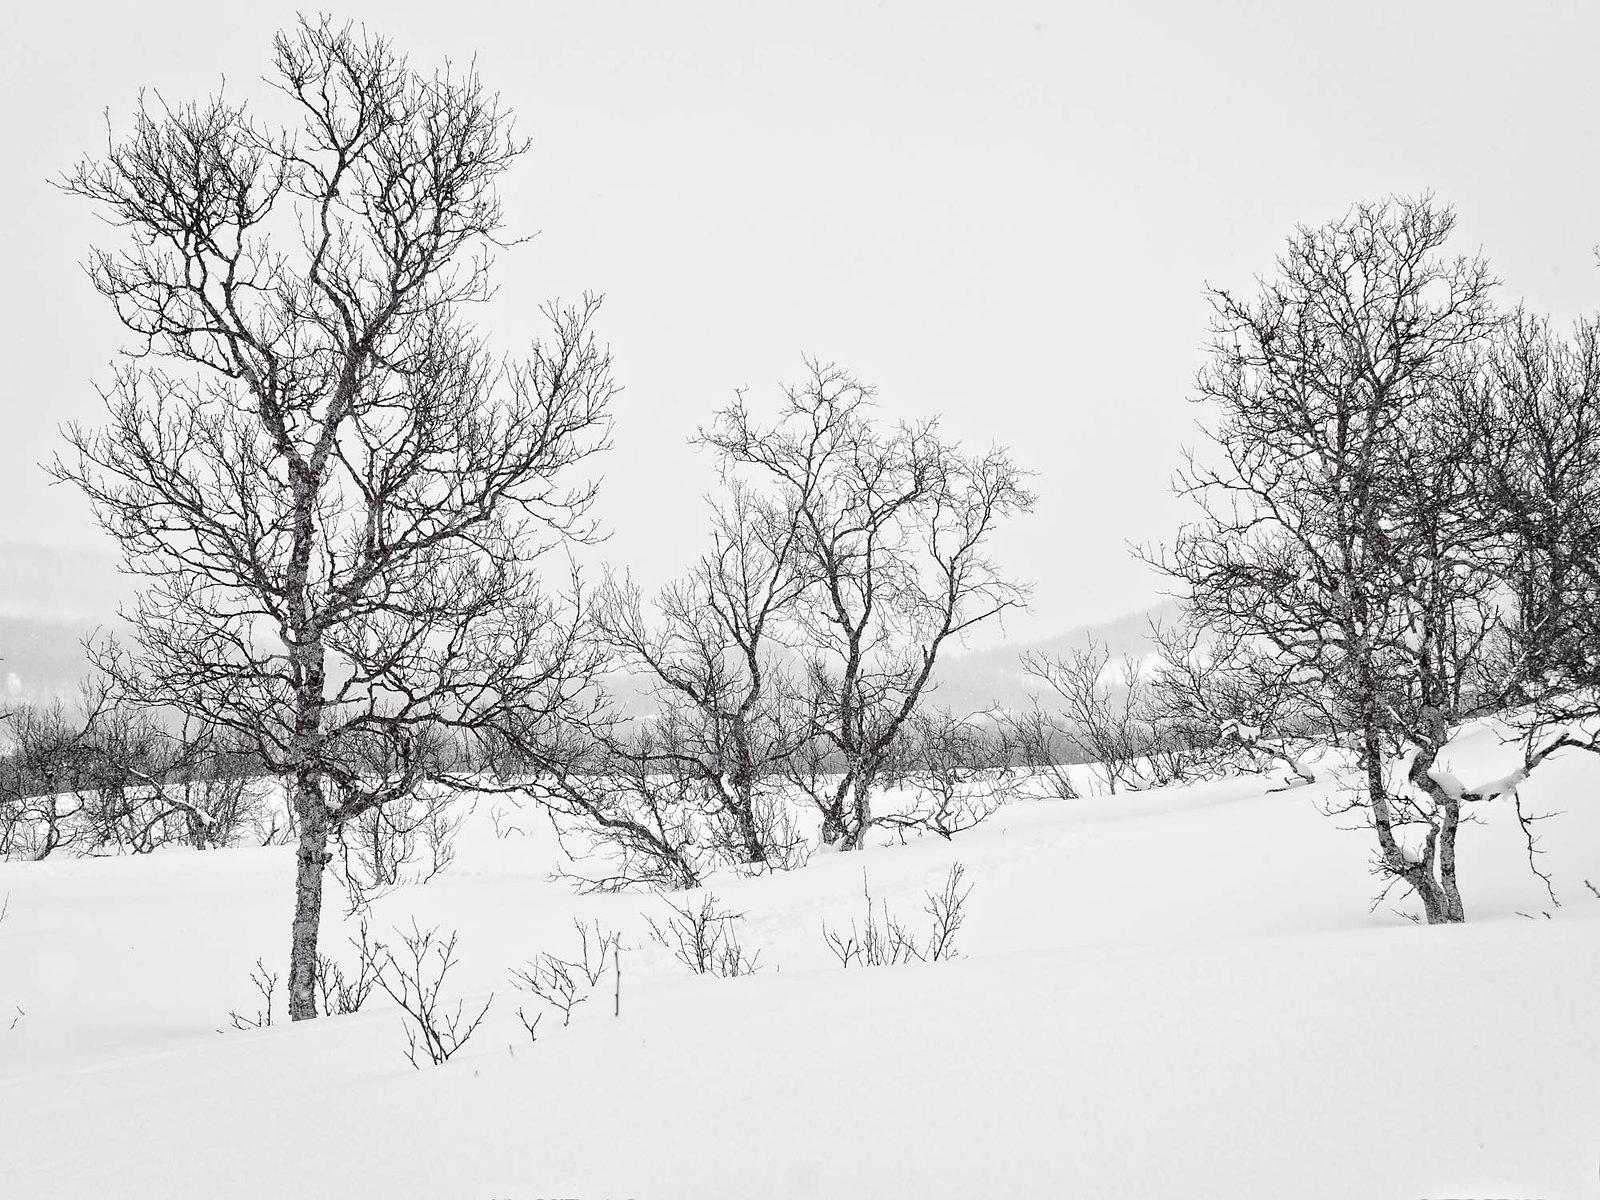 Trees in winter-2